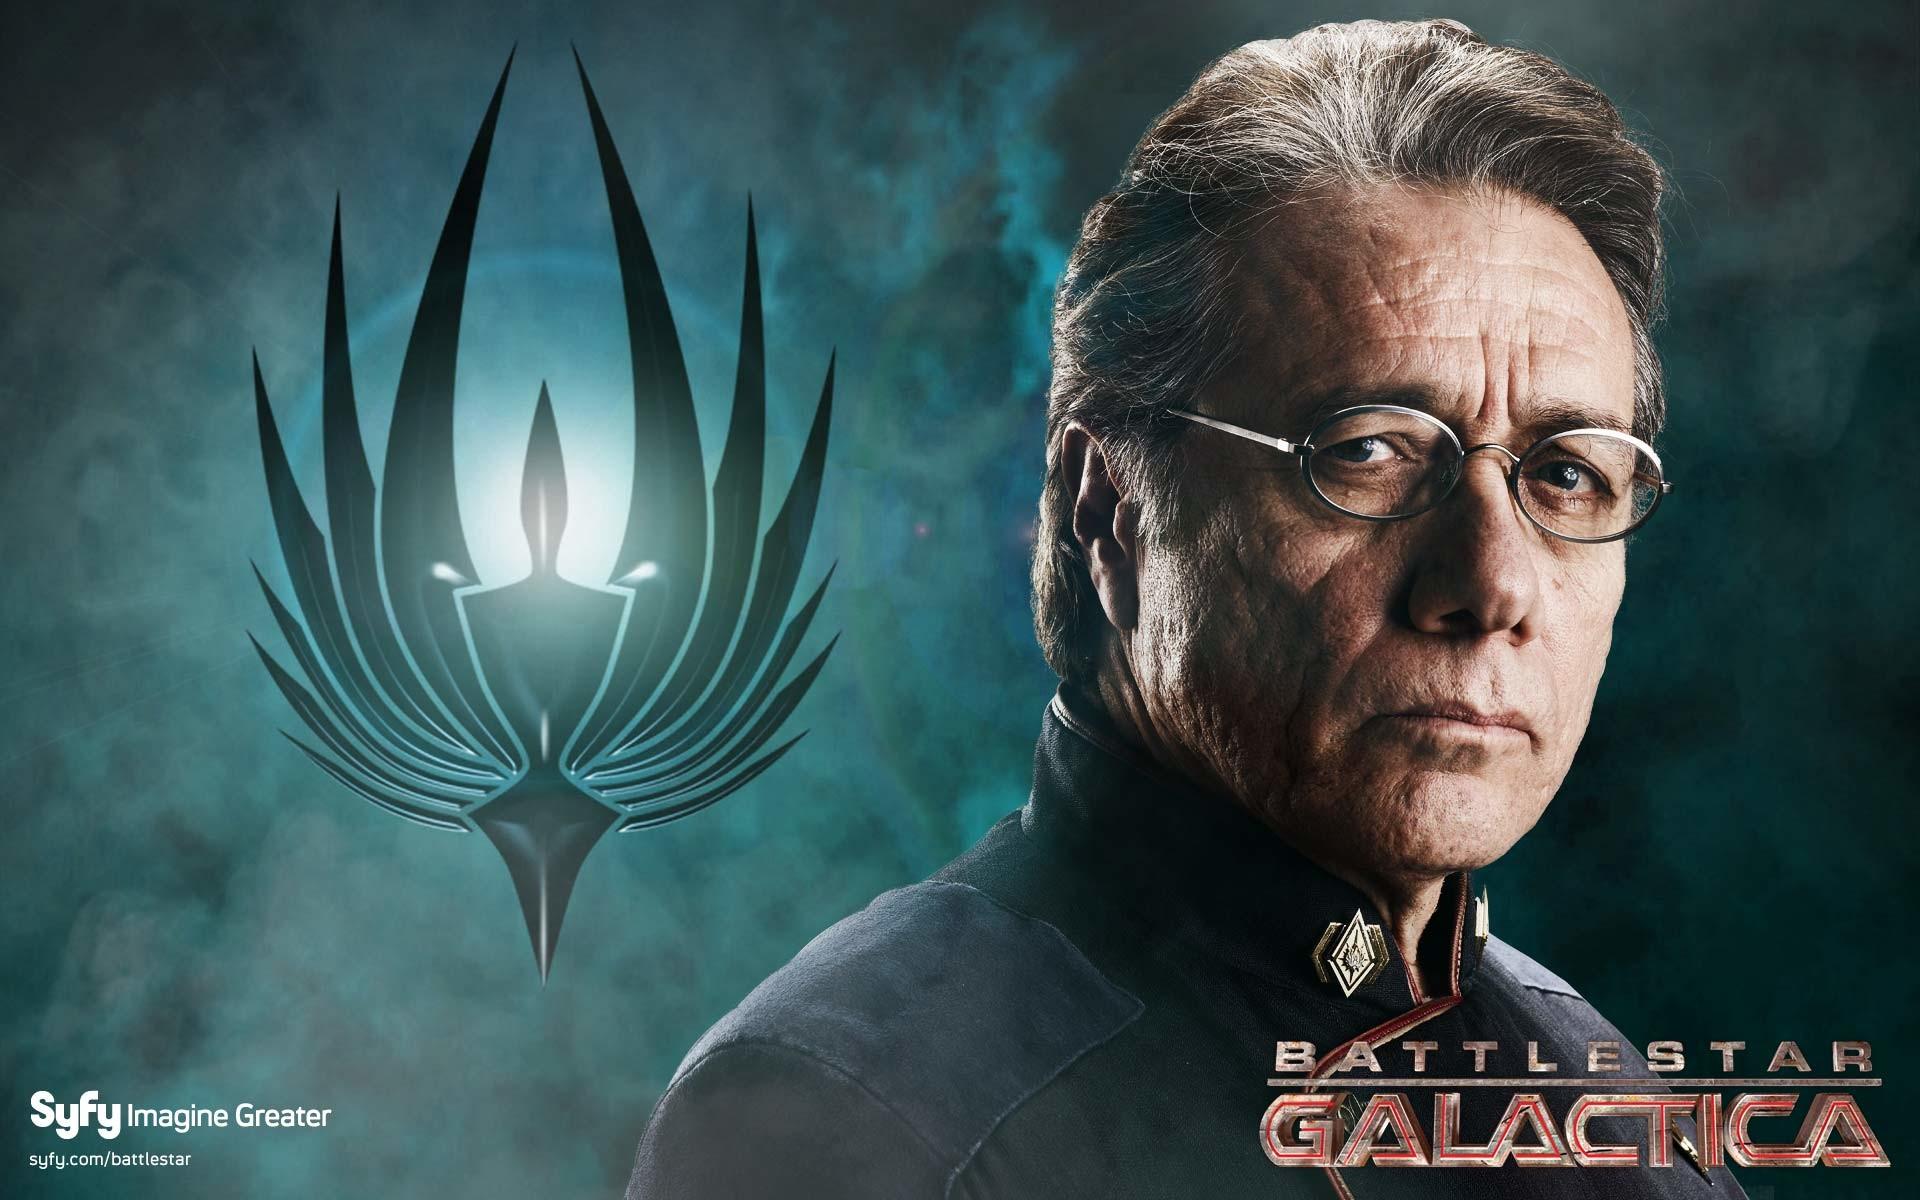 Battlestar Galactica Wallpapers – Full HD wallpaper search